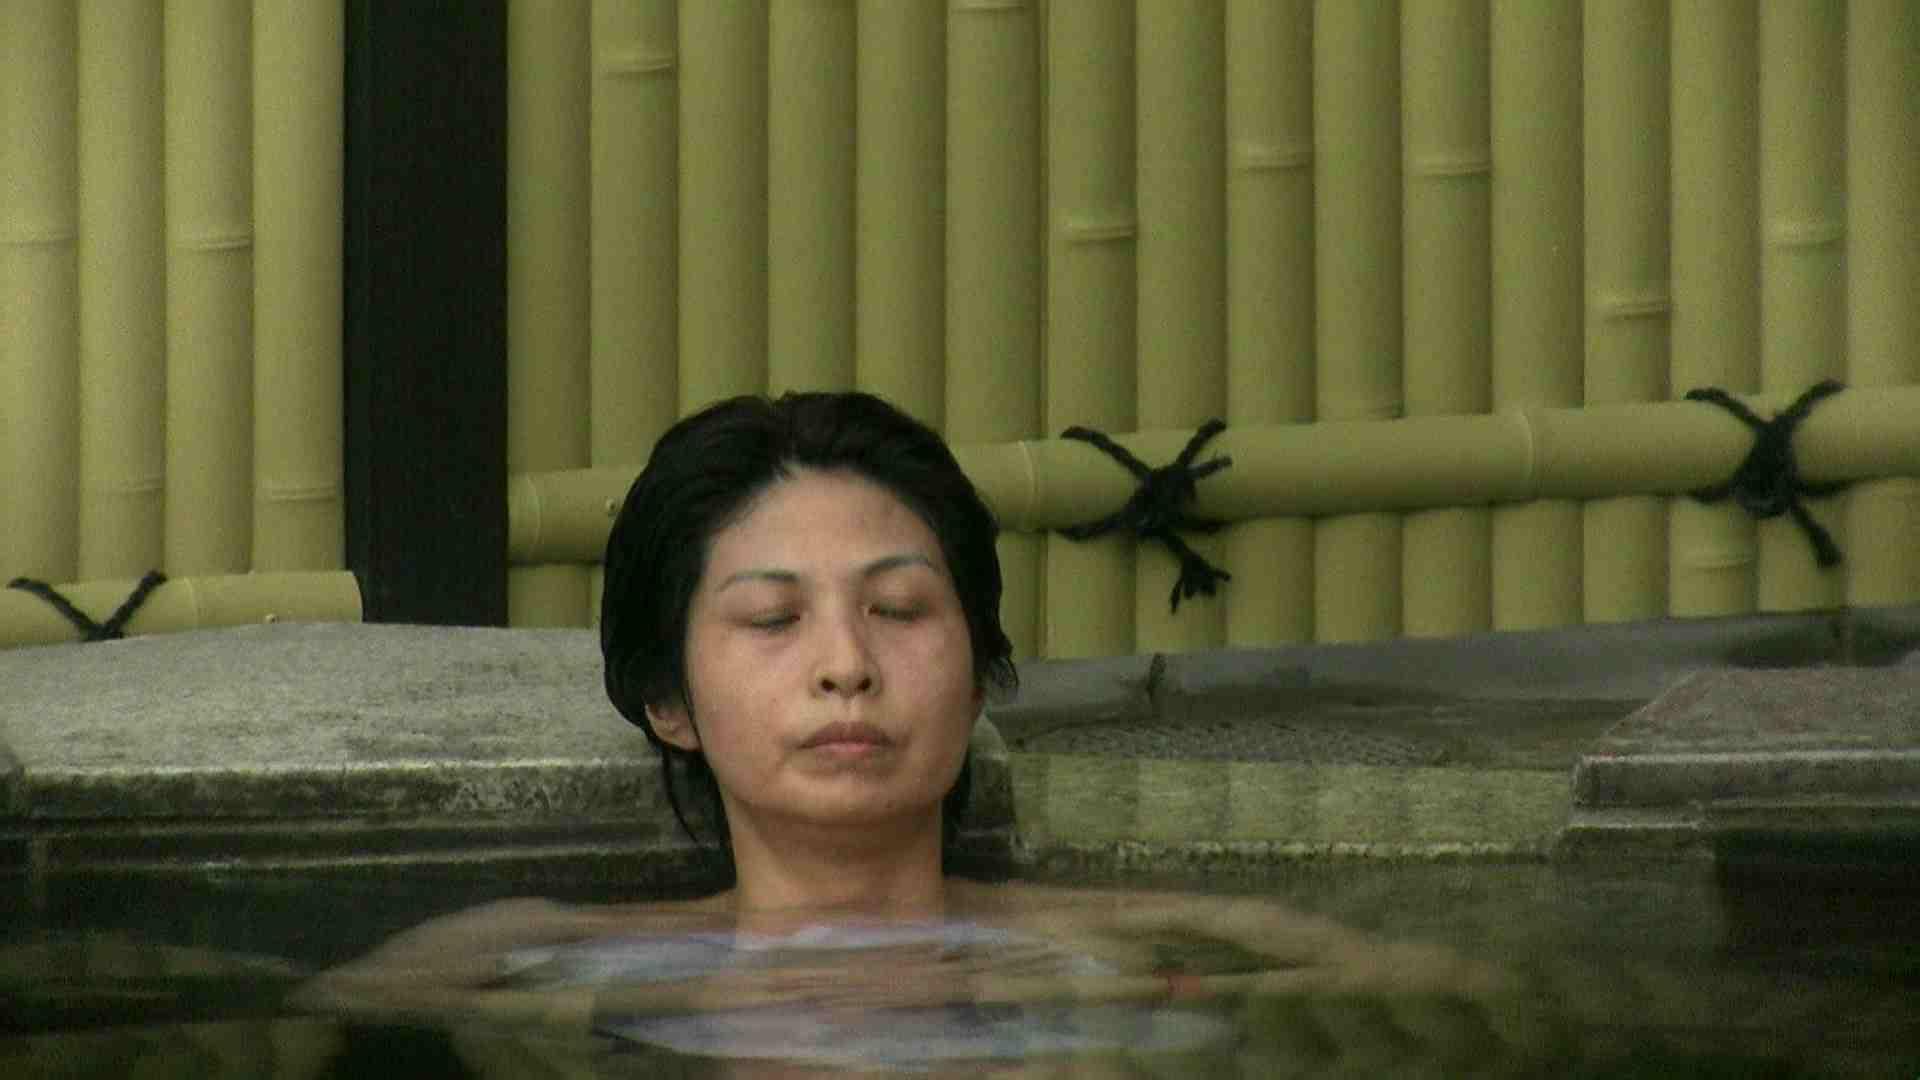 Aquaな露天風呂Vol.636 HなOL | 盗撮  82pic 25